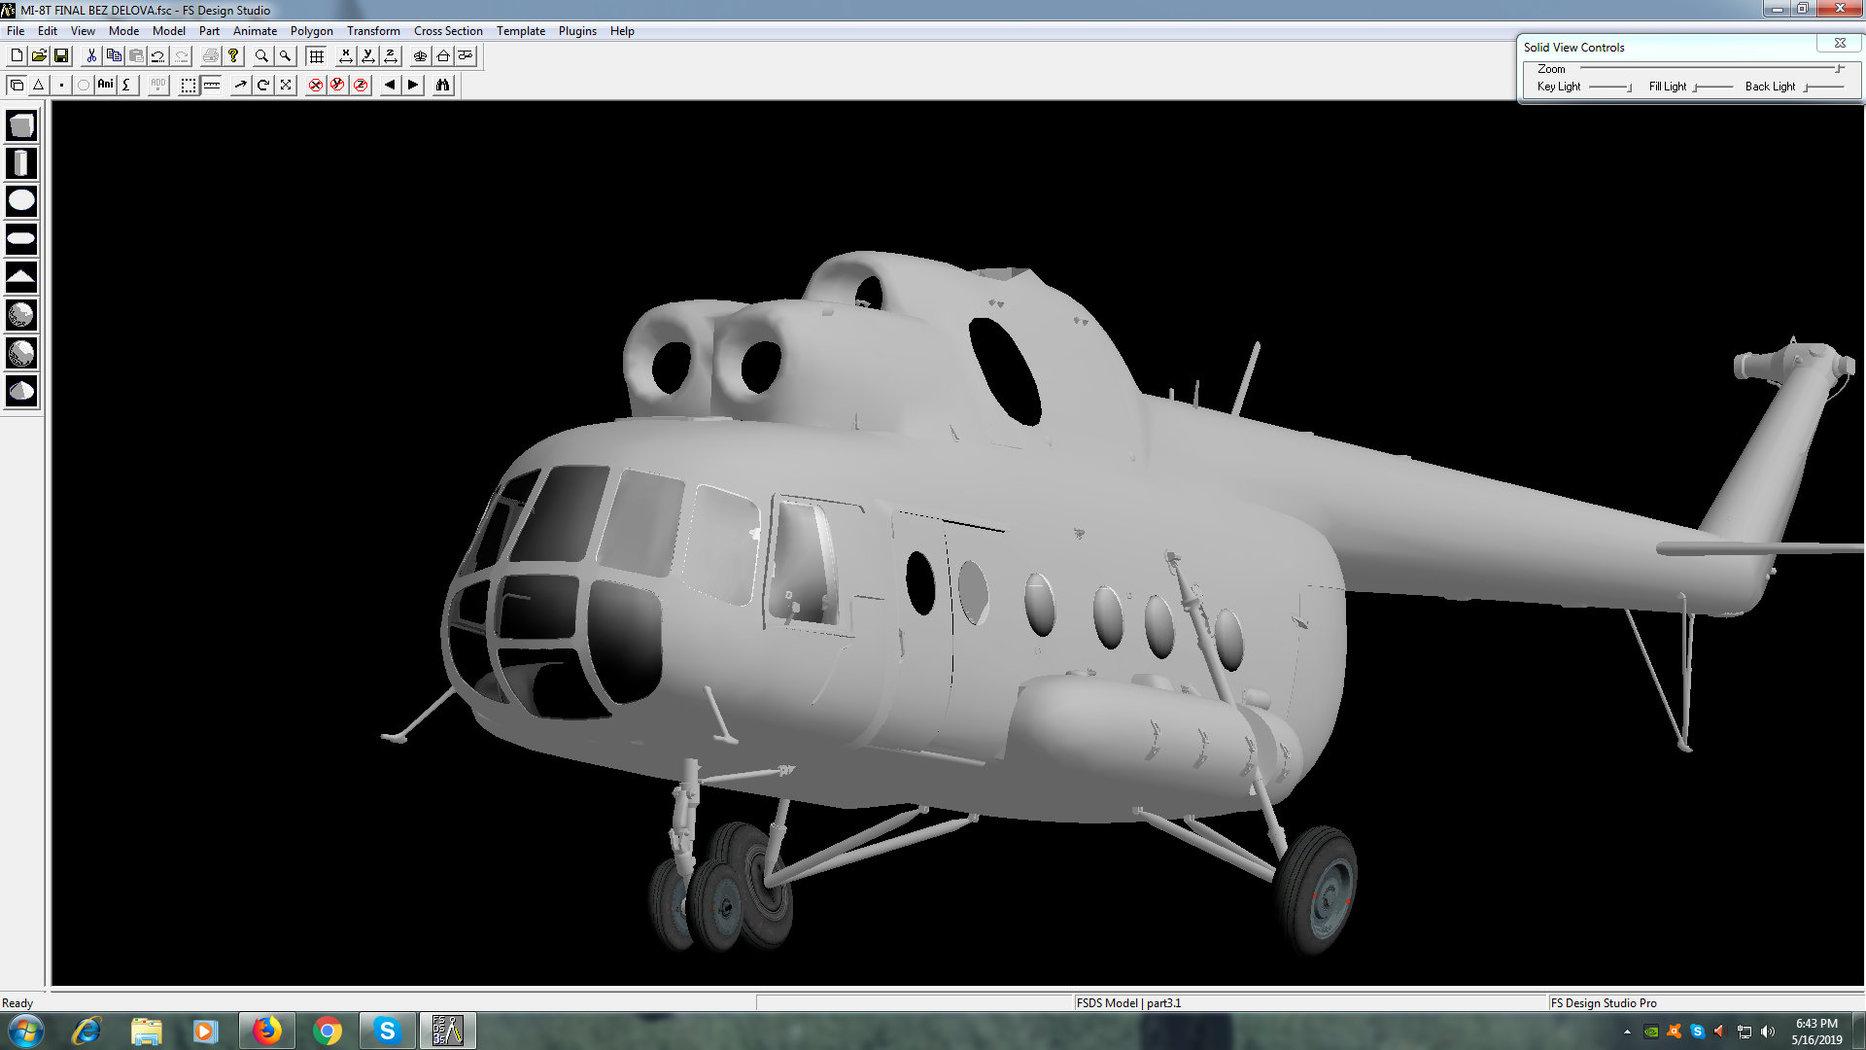 Mi-8T.jpg